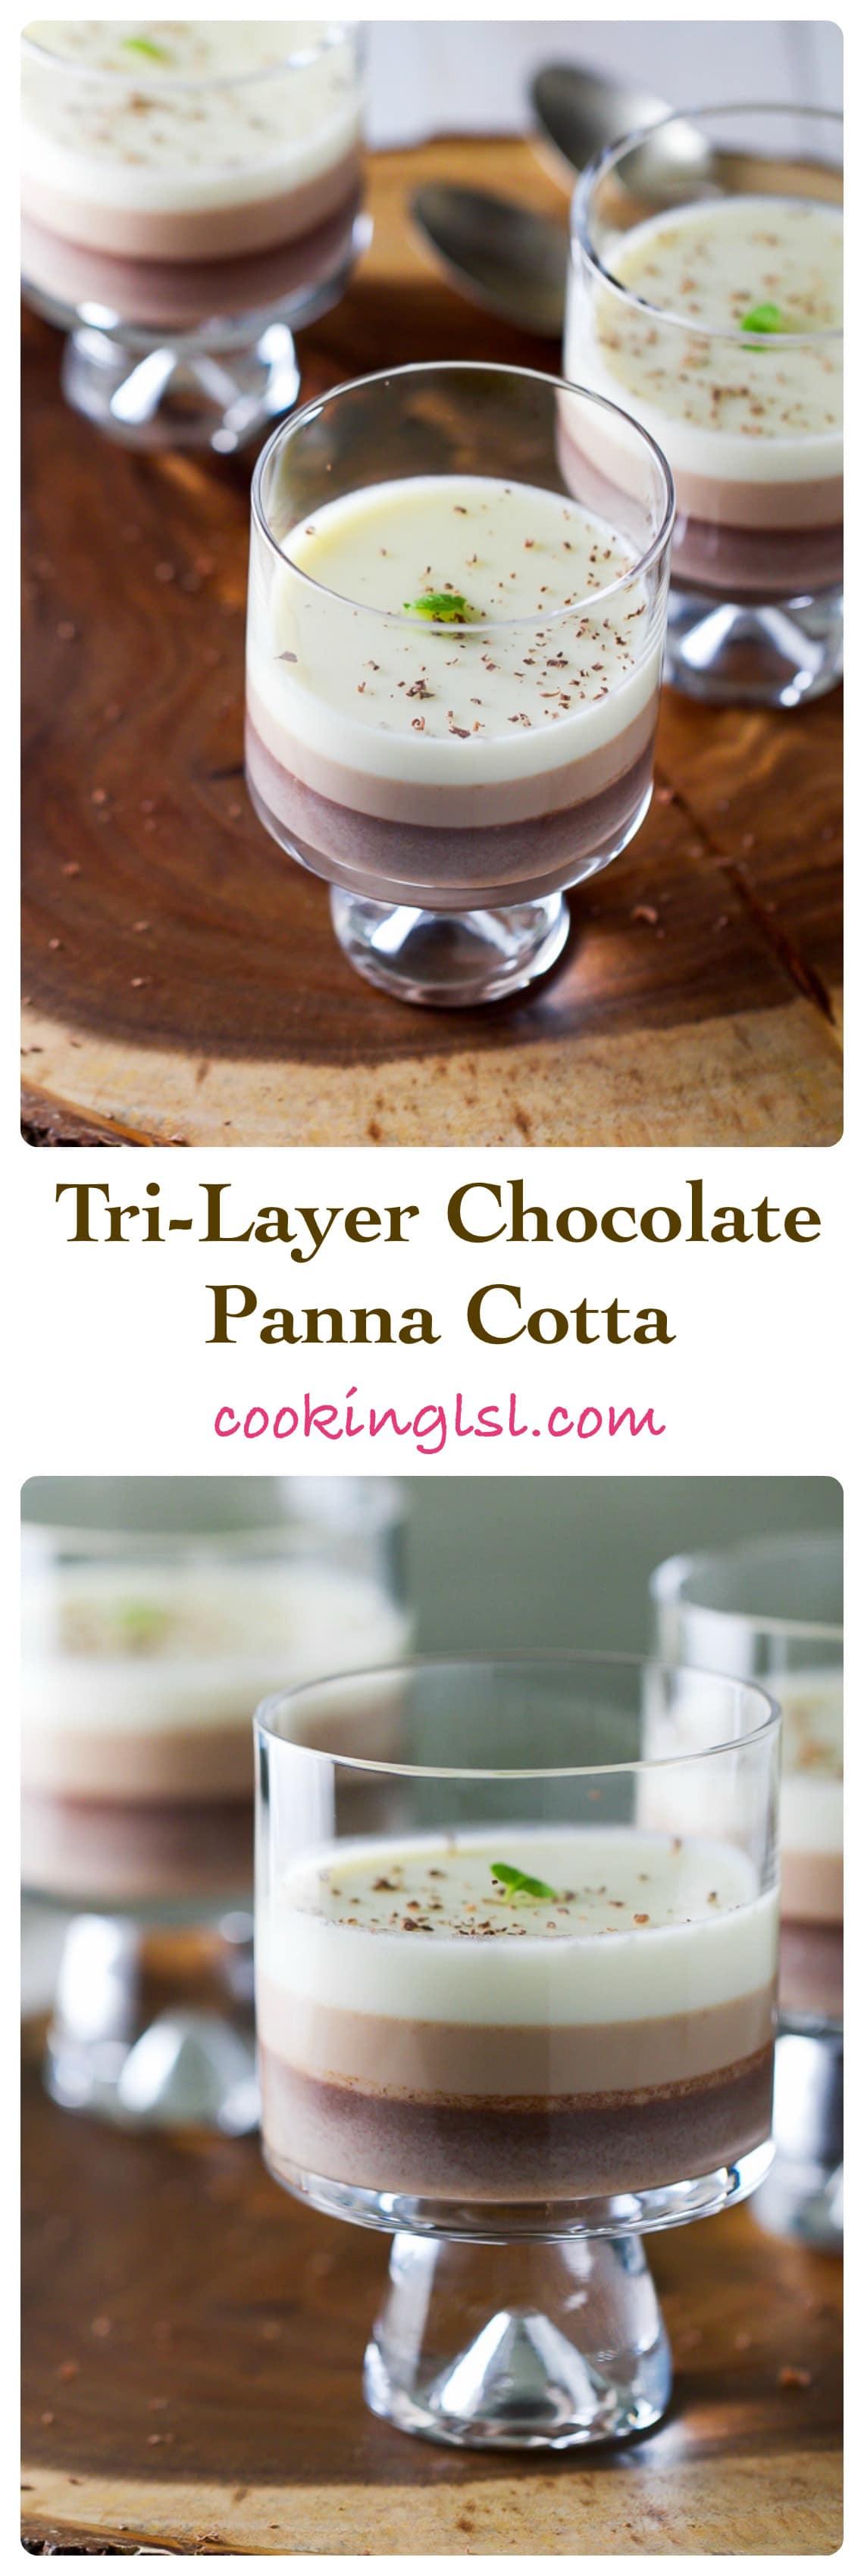 Tri-Layer-Chocolate-Panna-Cotta